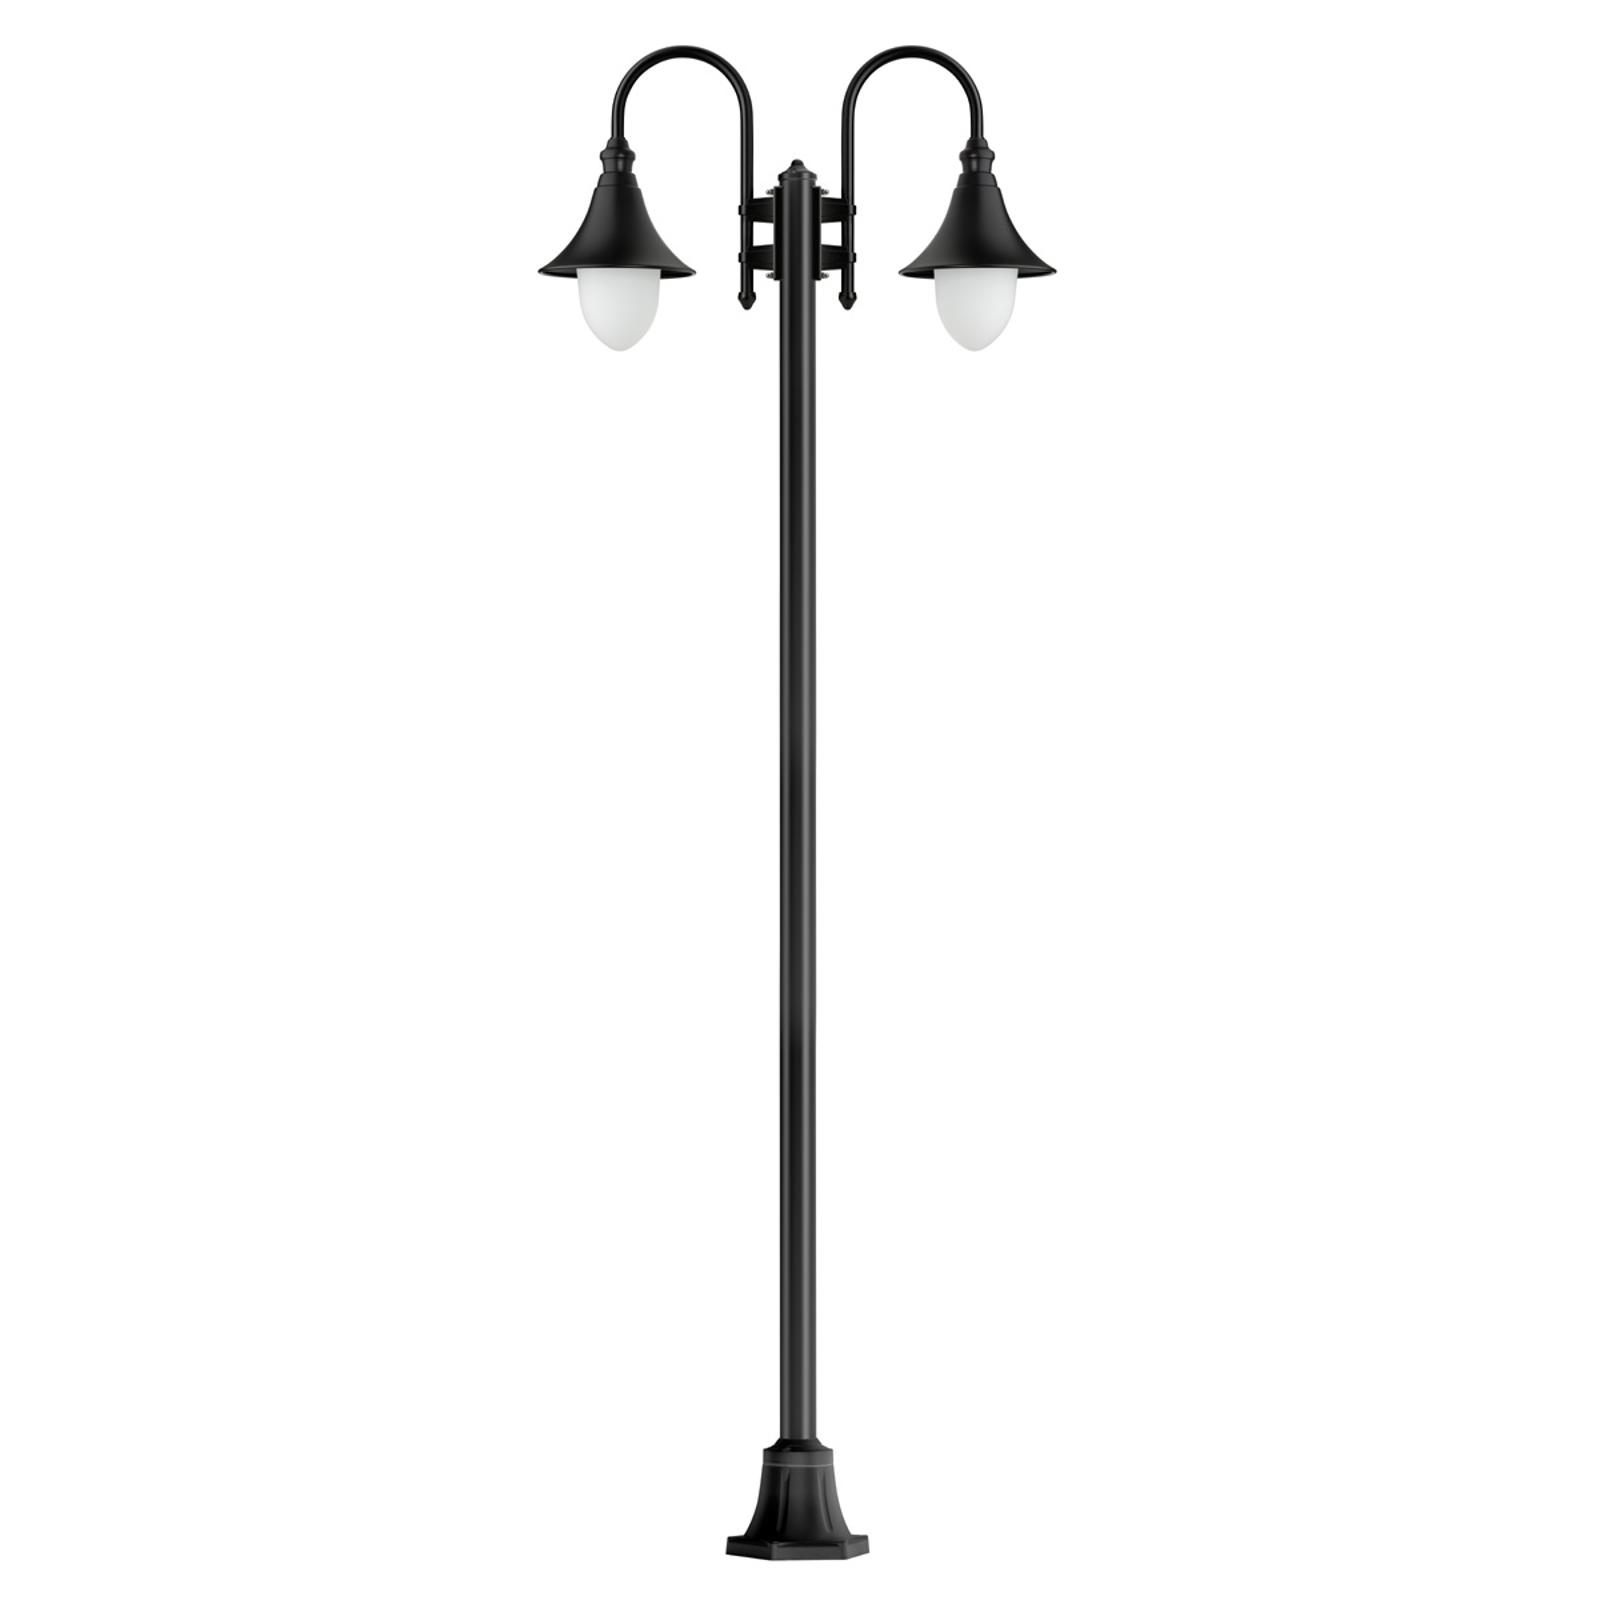 Miranda - 2-lichts lantaarnpaal, zwart